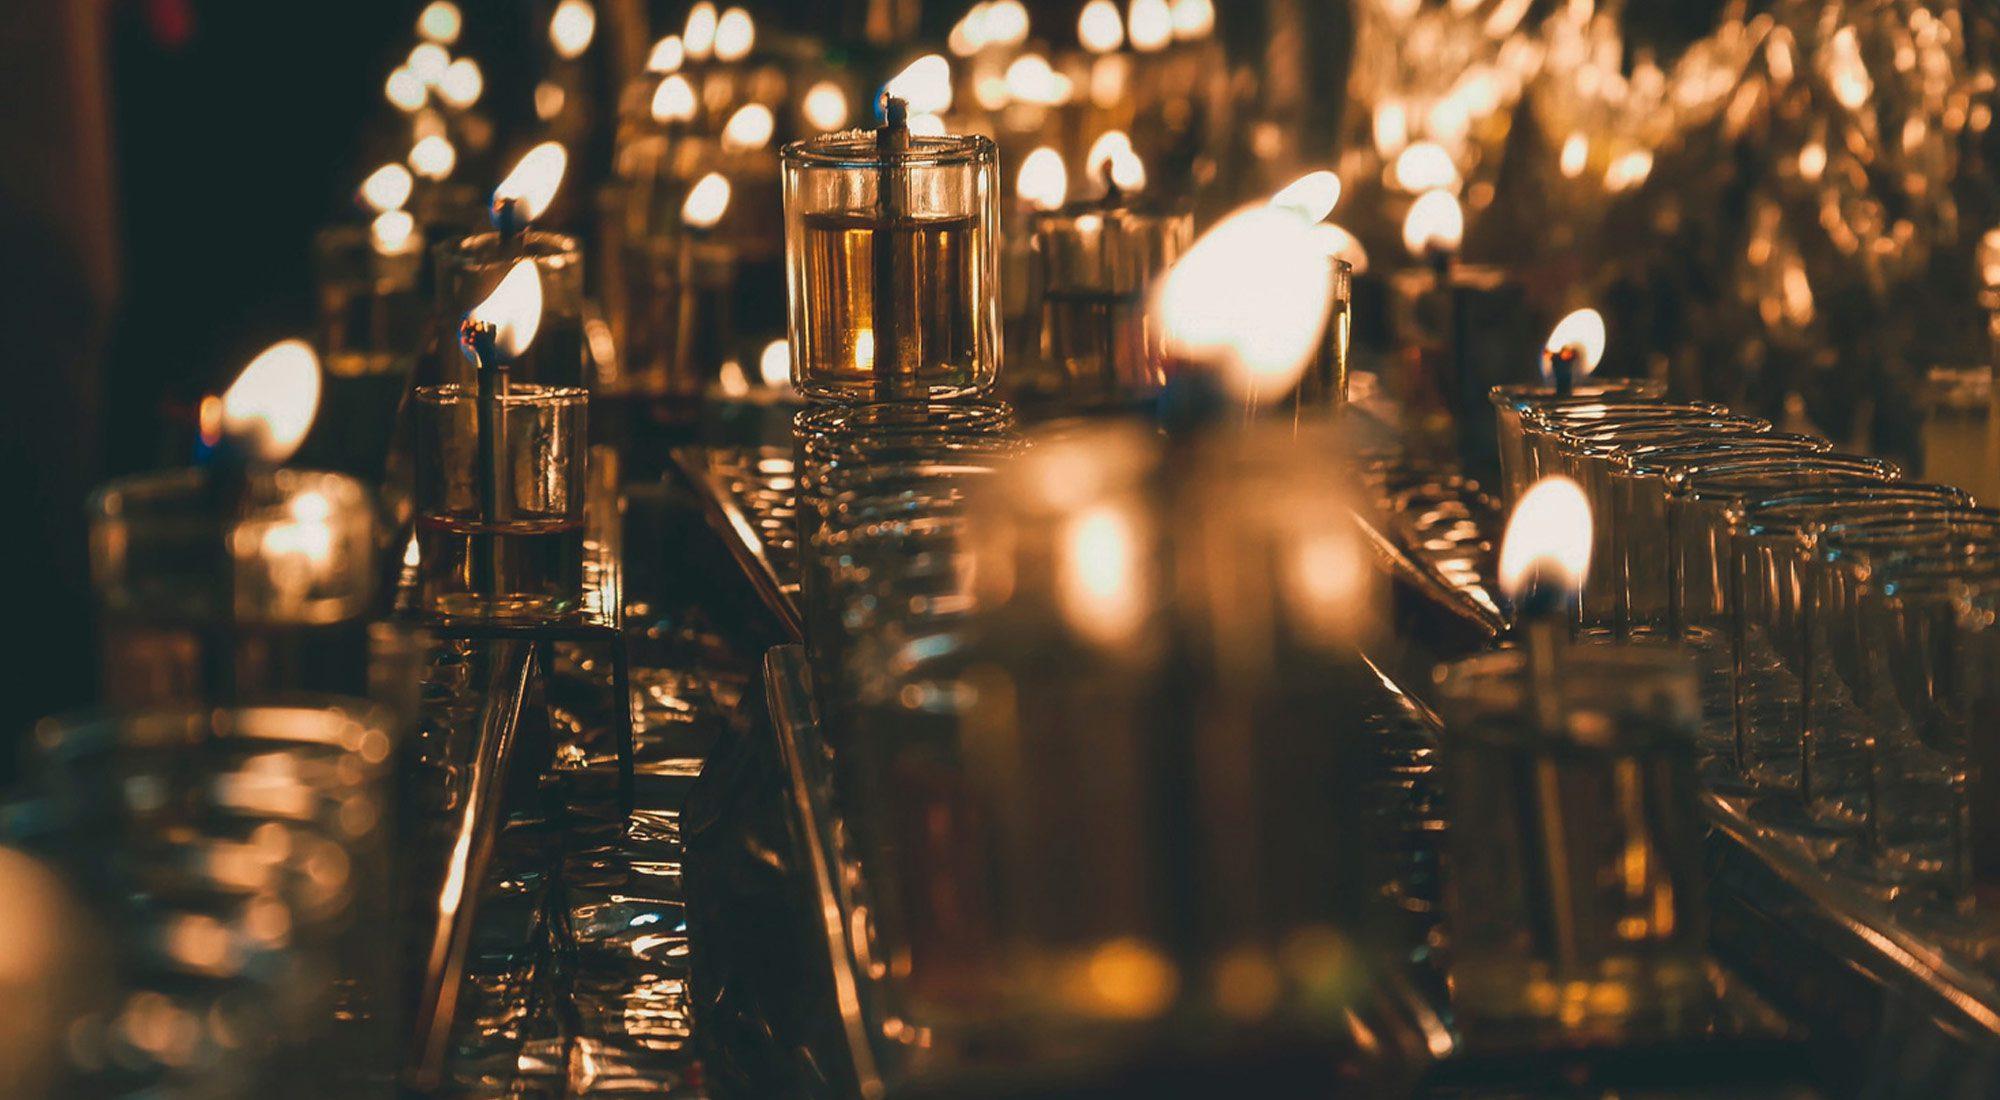 Candle-lit bar